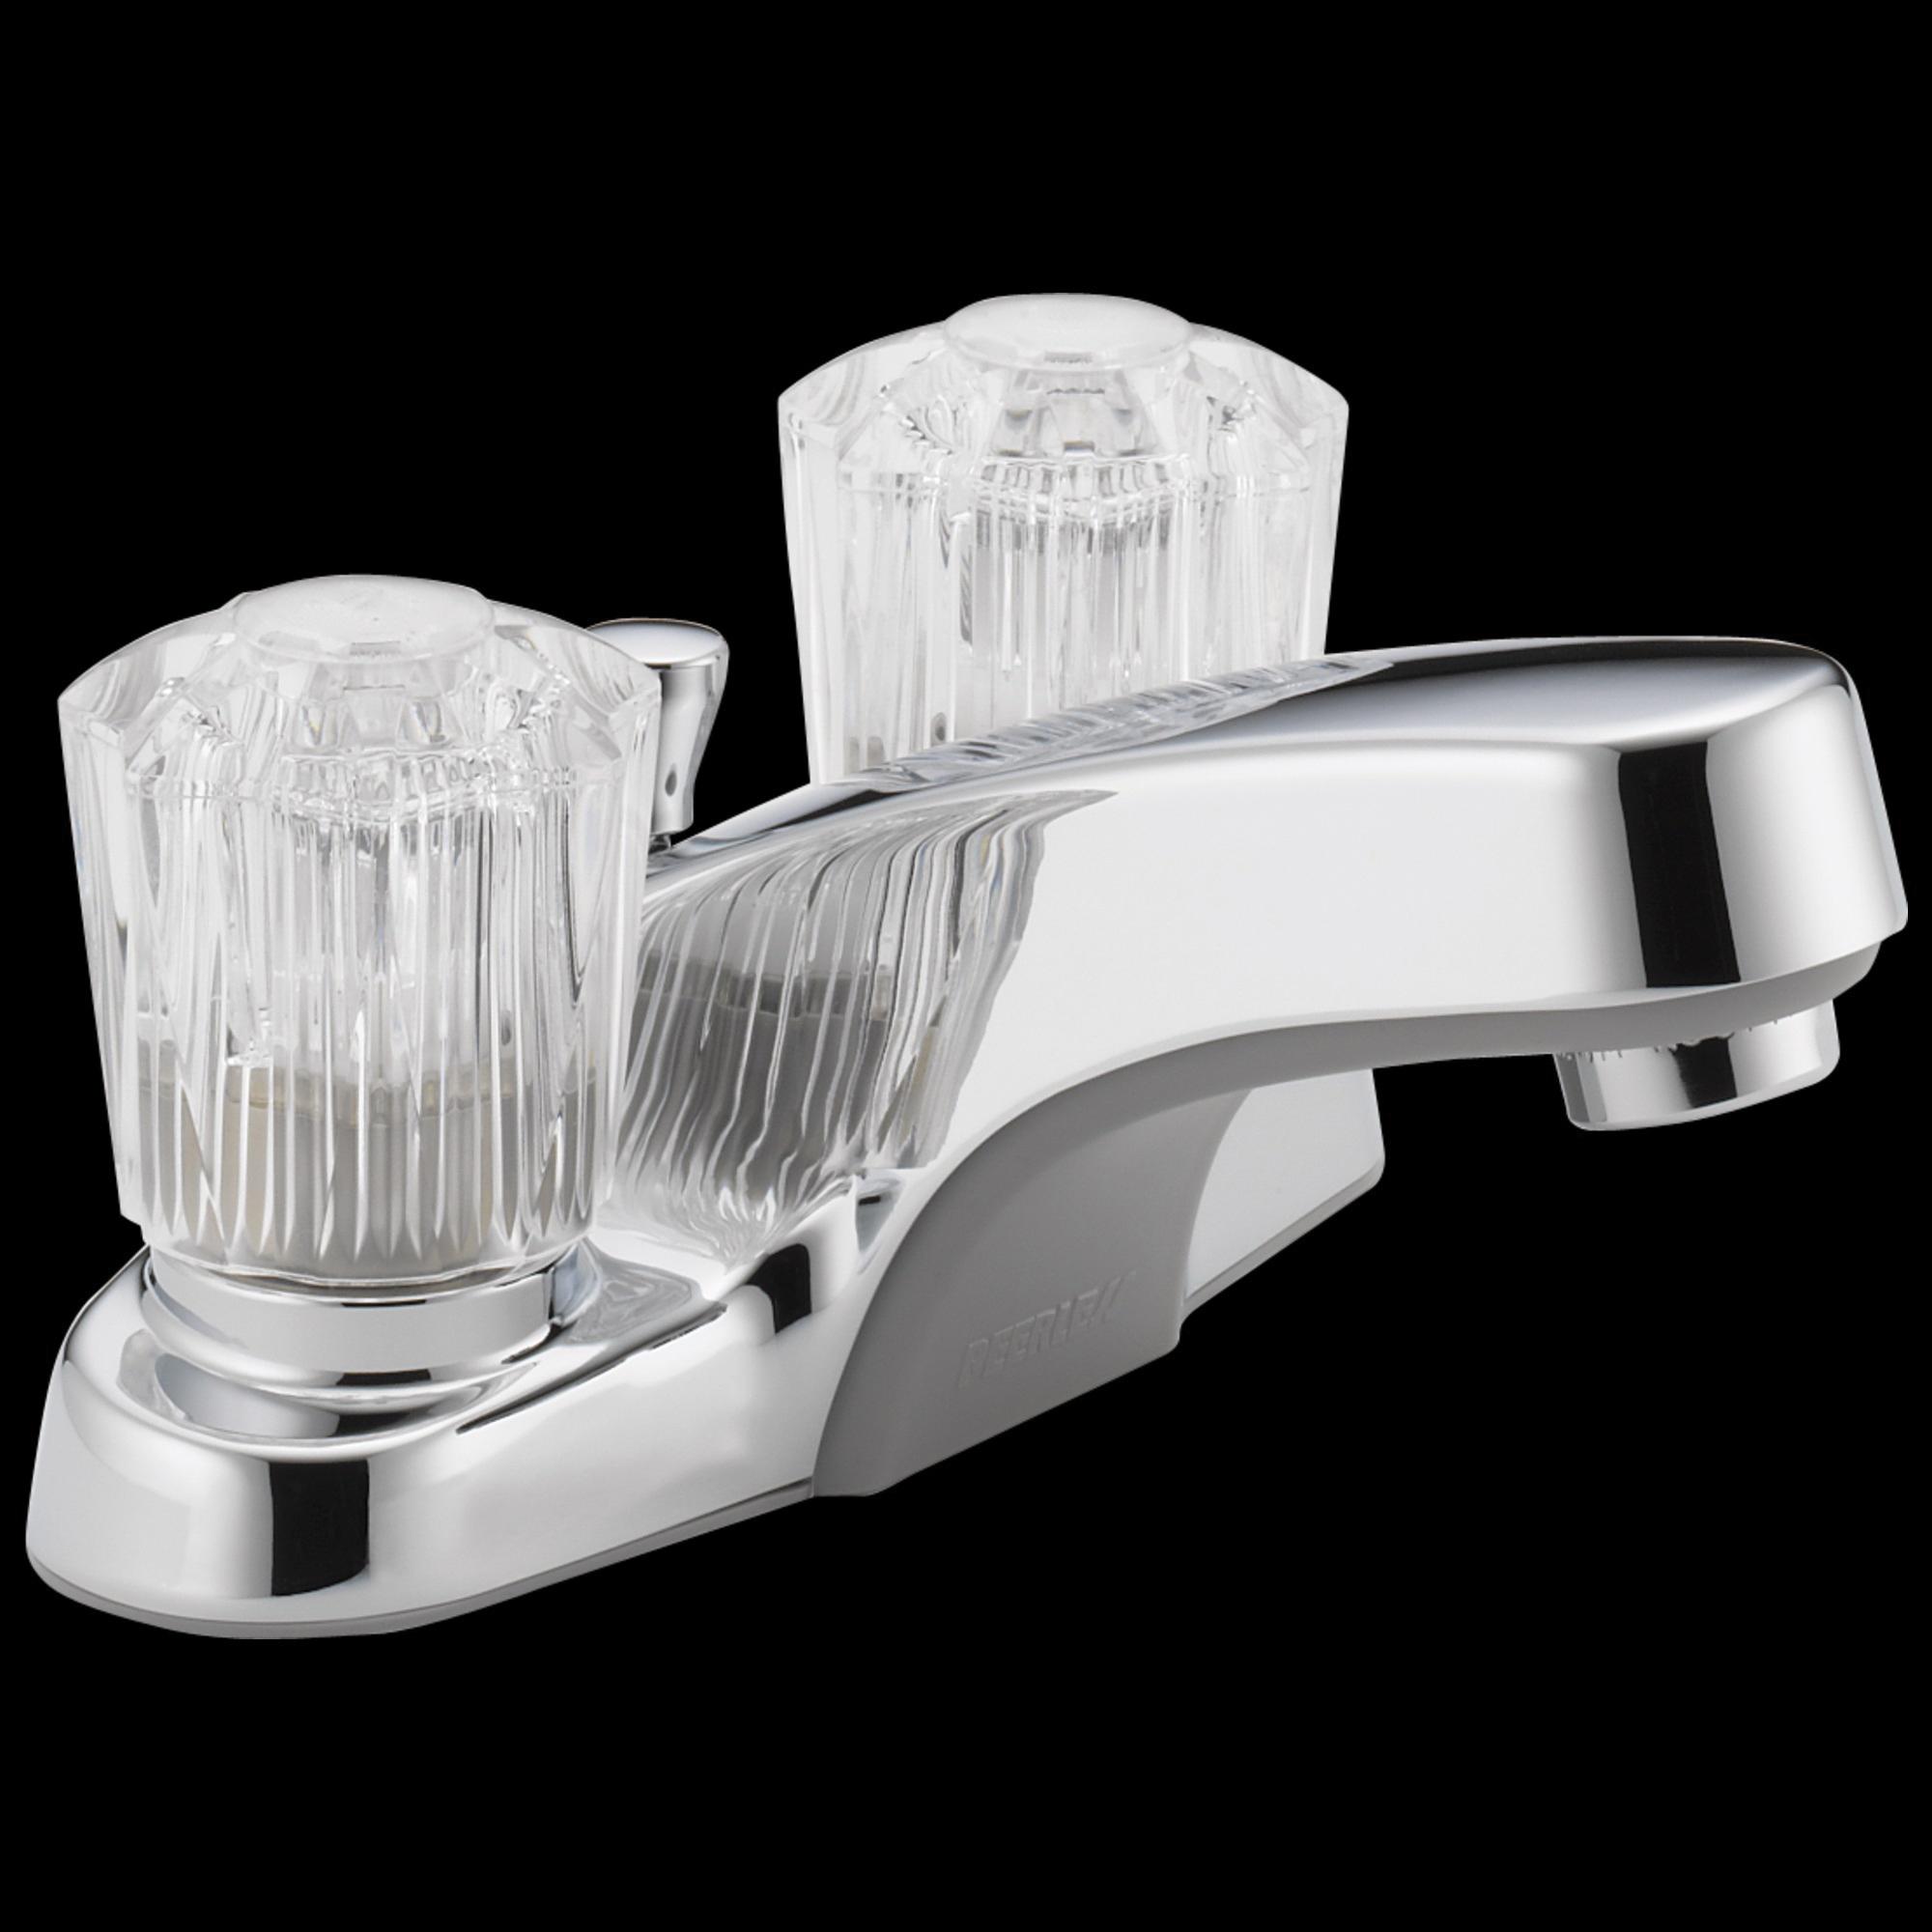 Picture of DELTA Peerless P245LF Bathroom Faucet, 1.2 gpm, 2-Faucet Handle, Metal, Chrome, Knob Handle, Standard Spout